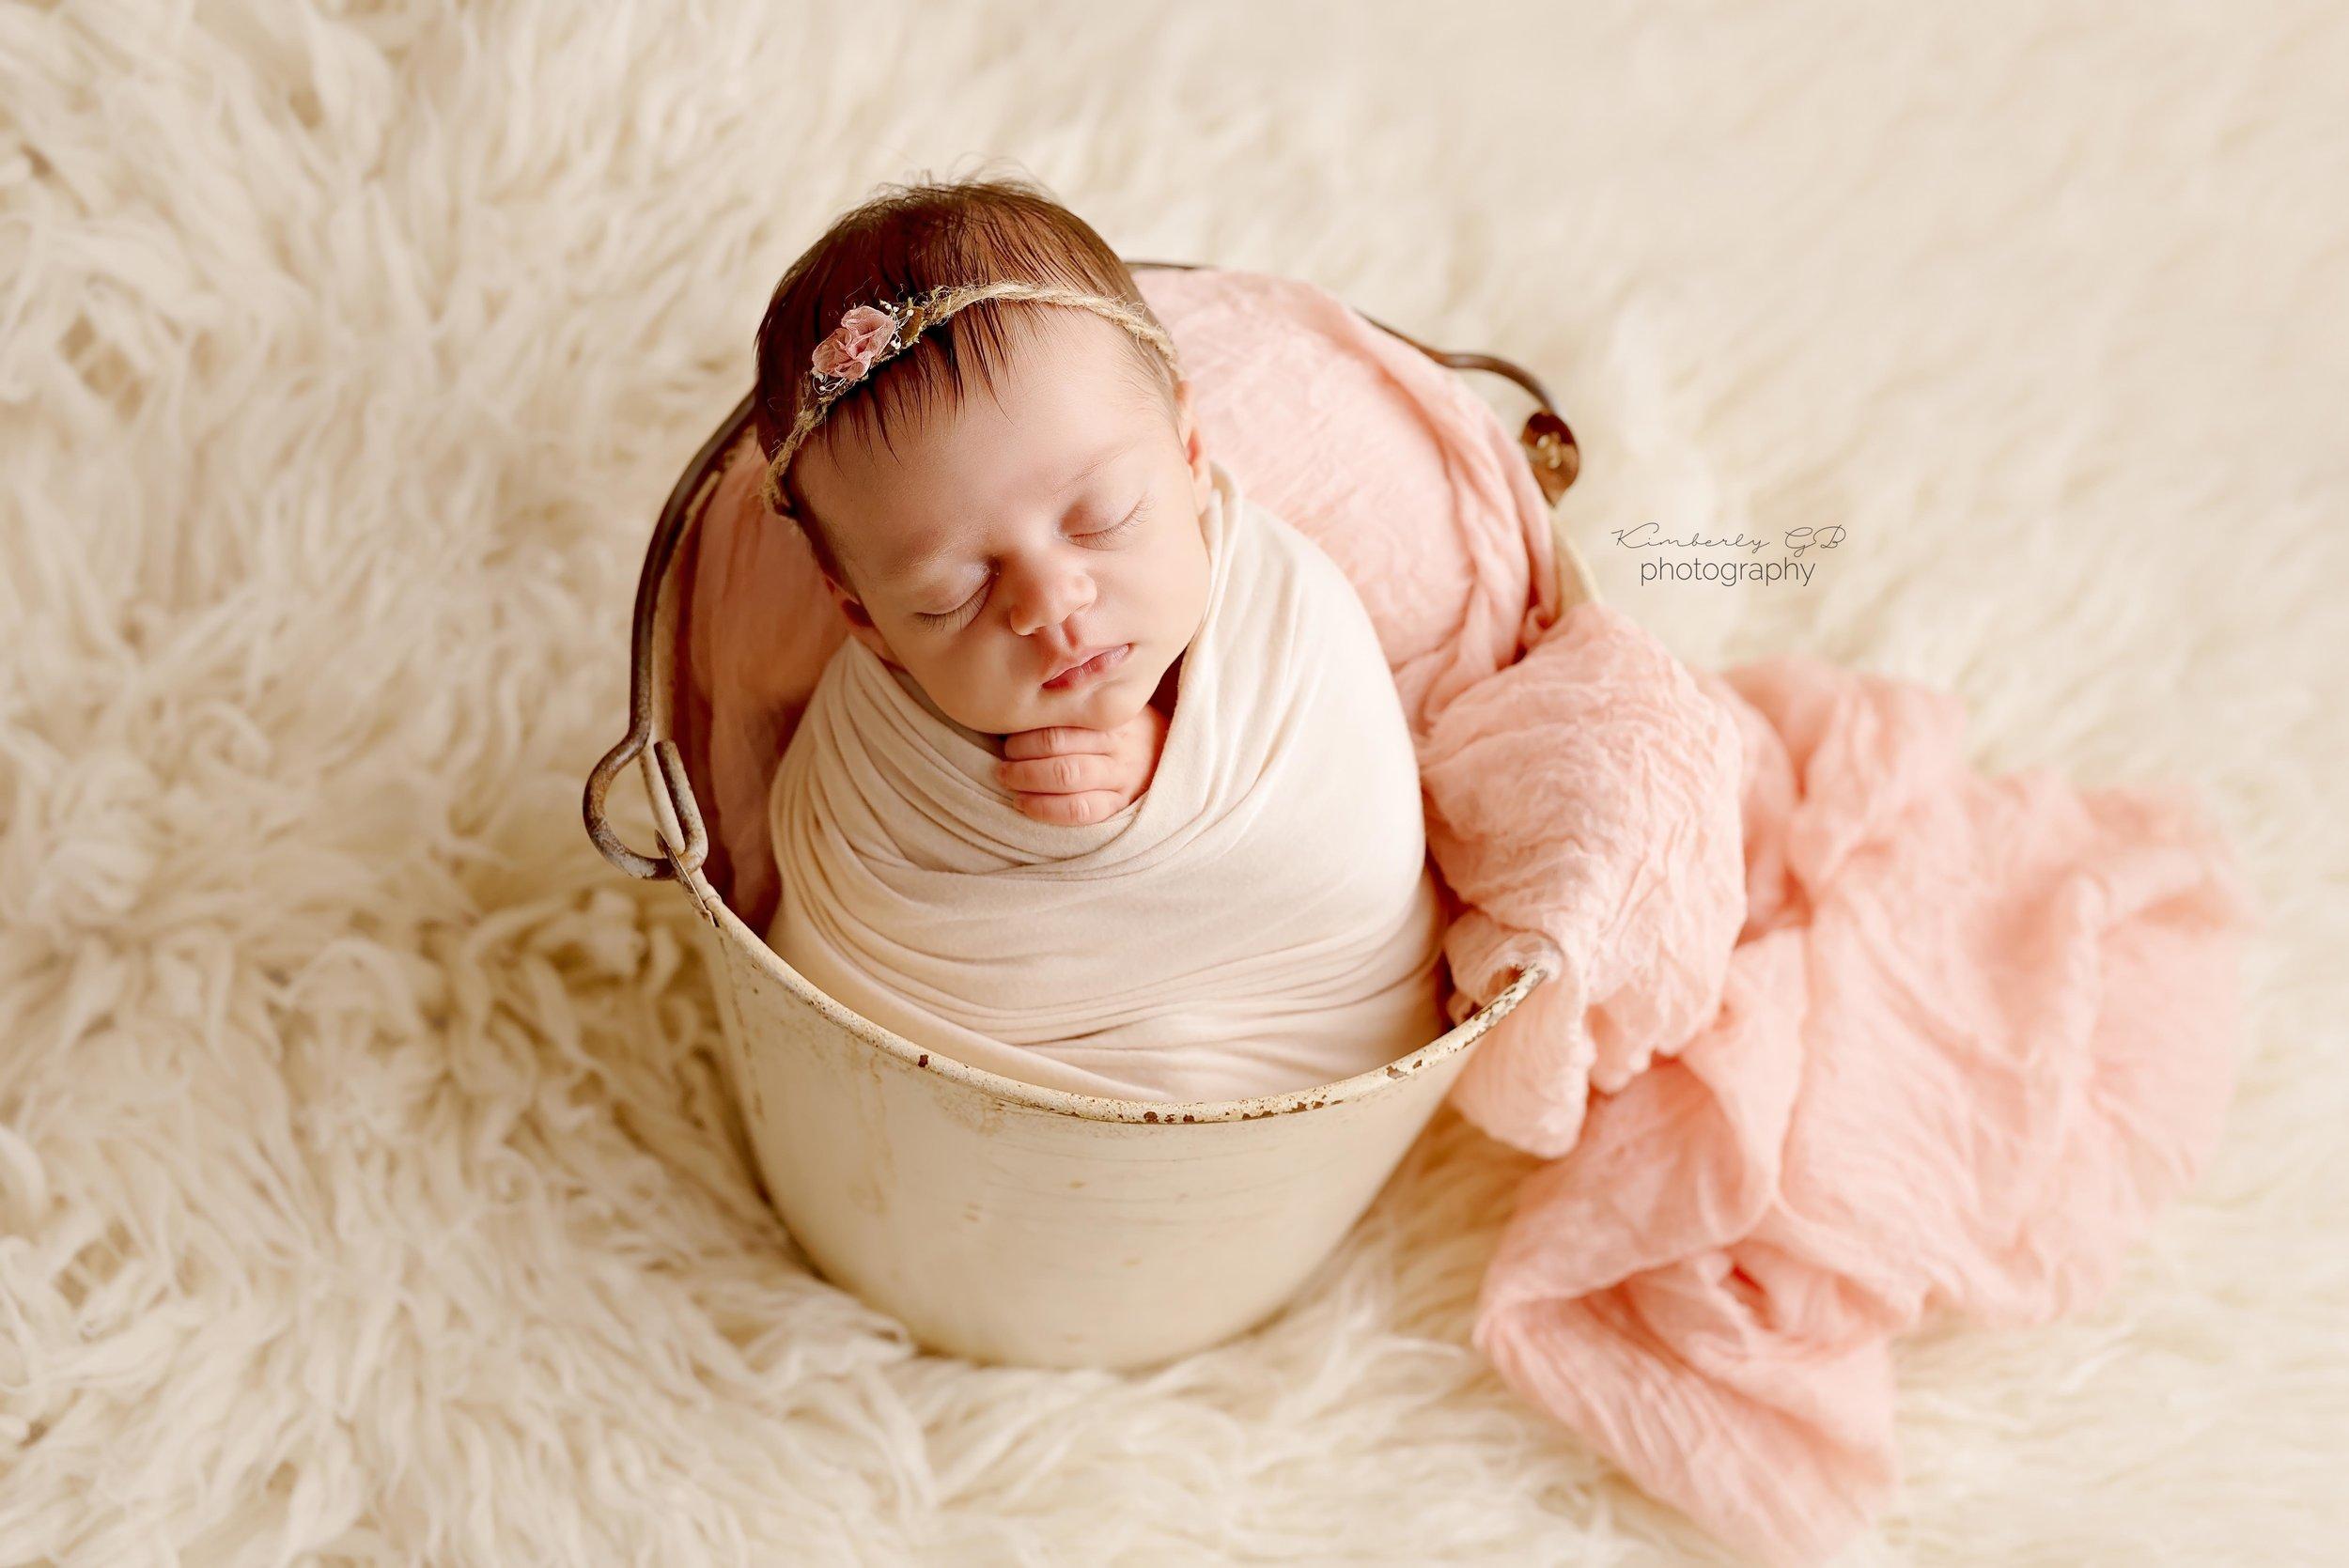 fotografia-de-recien-nacidos-bebes-newborn-en-puerto-rico-kimberly-gb-photography-fotografa-233.jpg